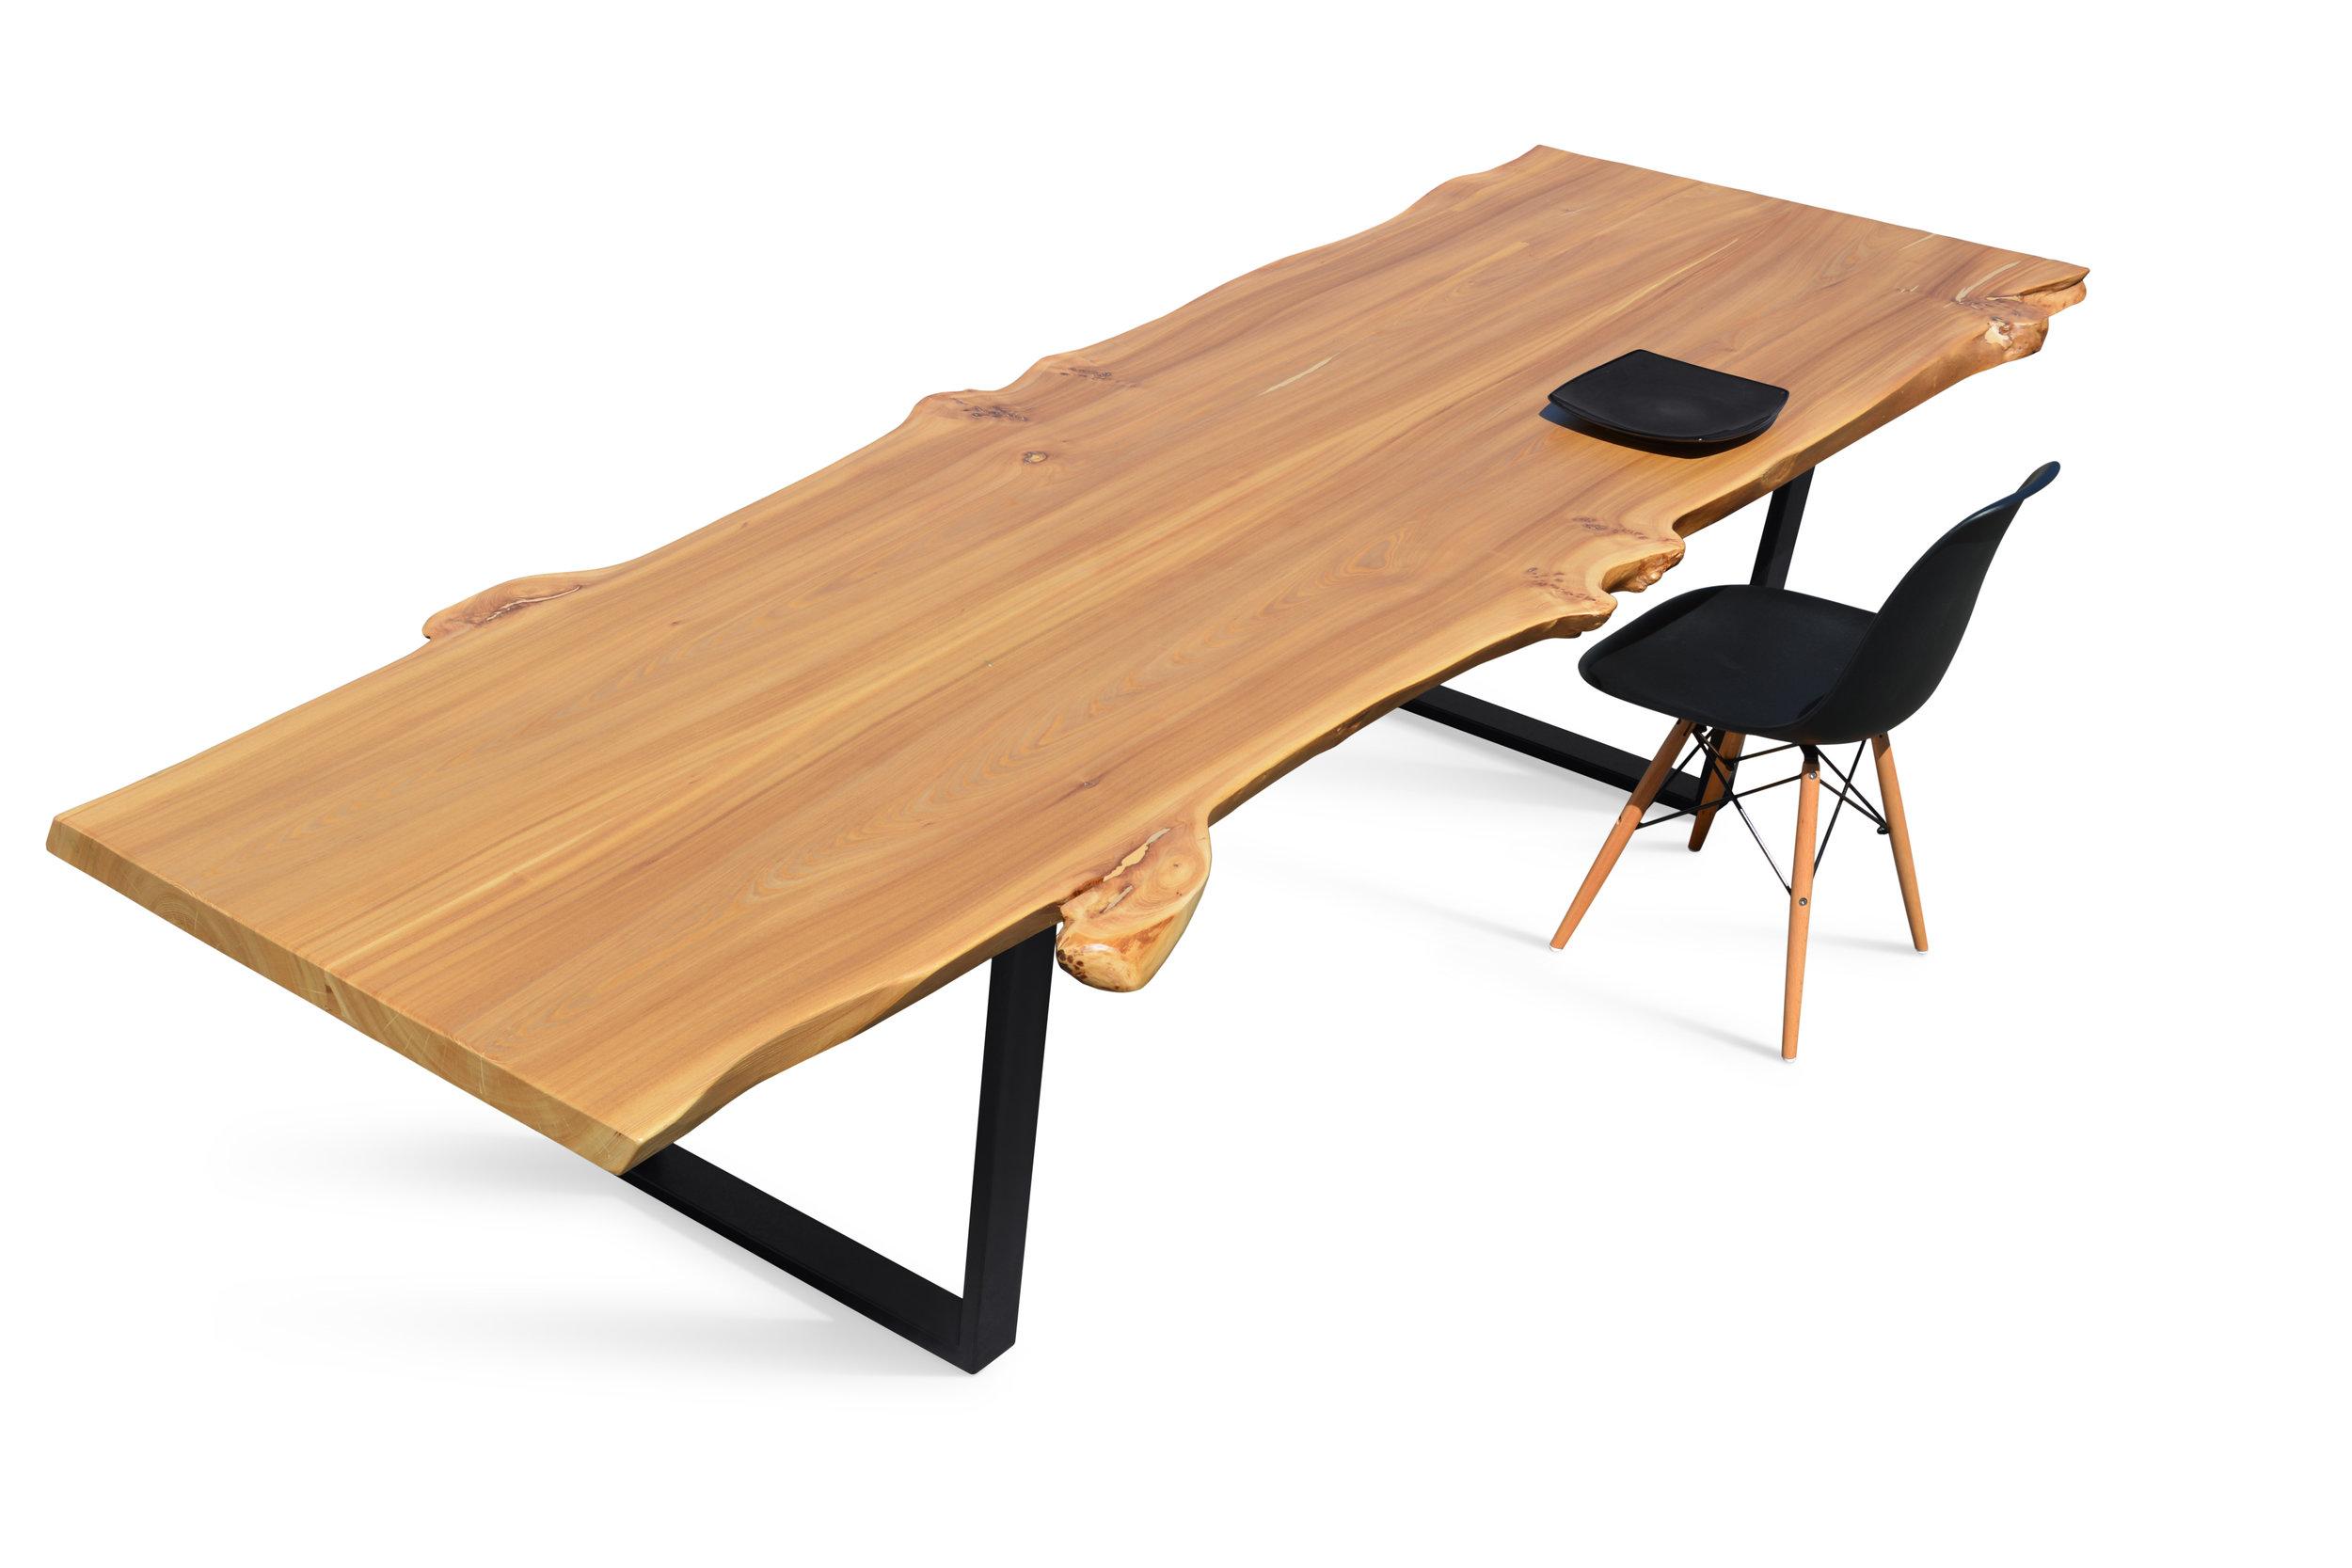 Etz & Steel Wave Live Edge Table Dining Example 1.JPG